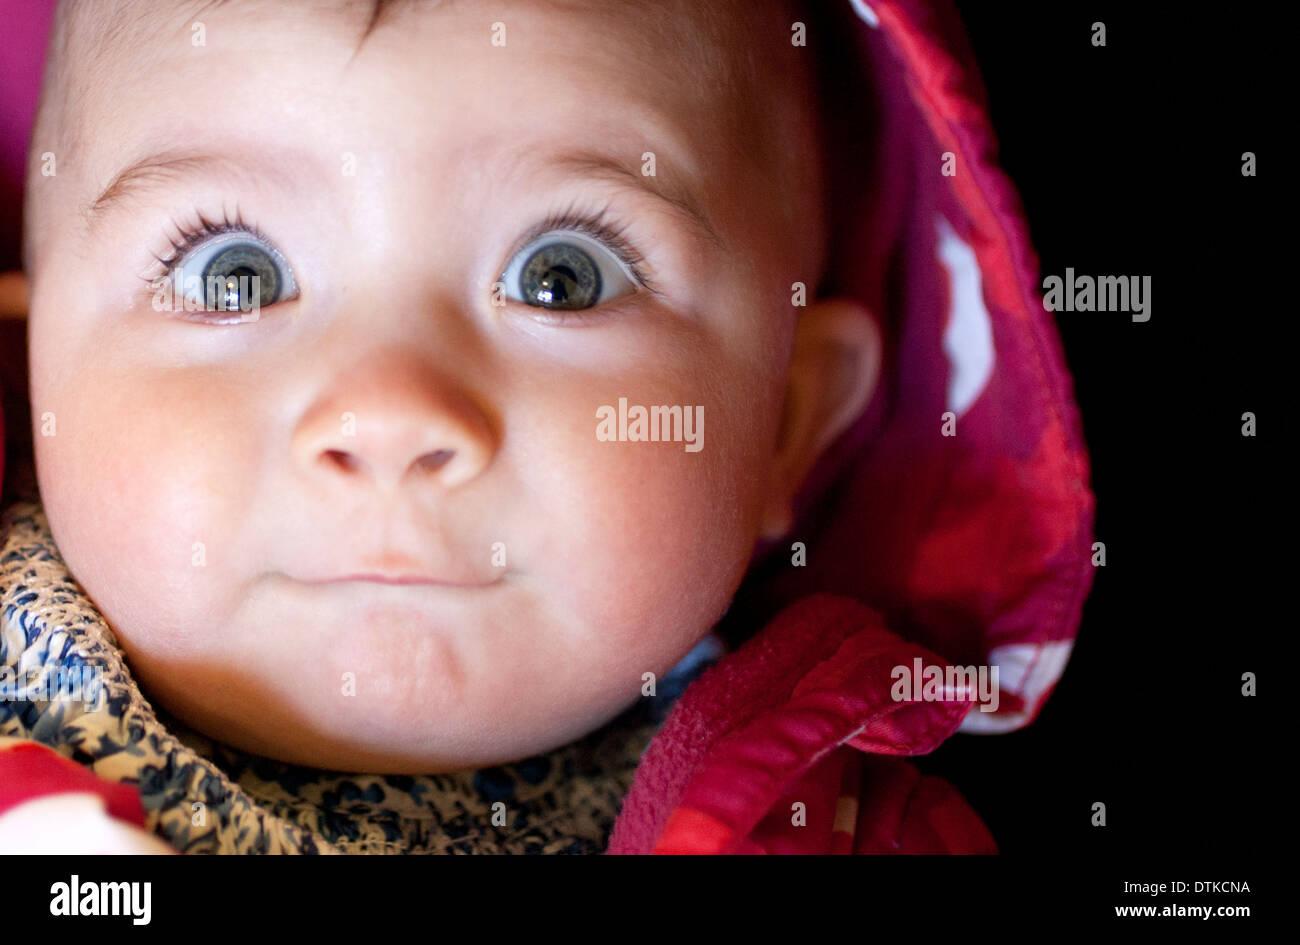 Cerca de la cara de sorpresa del bebé niña Imagen De Stock